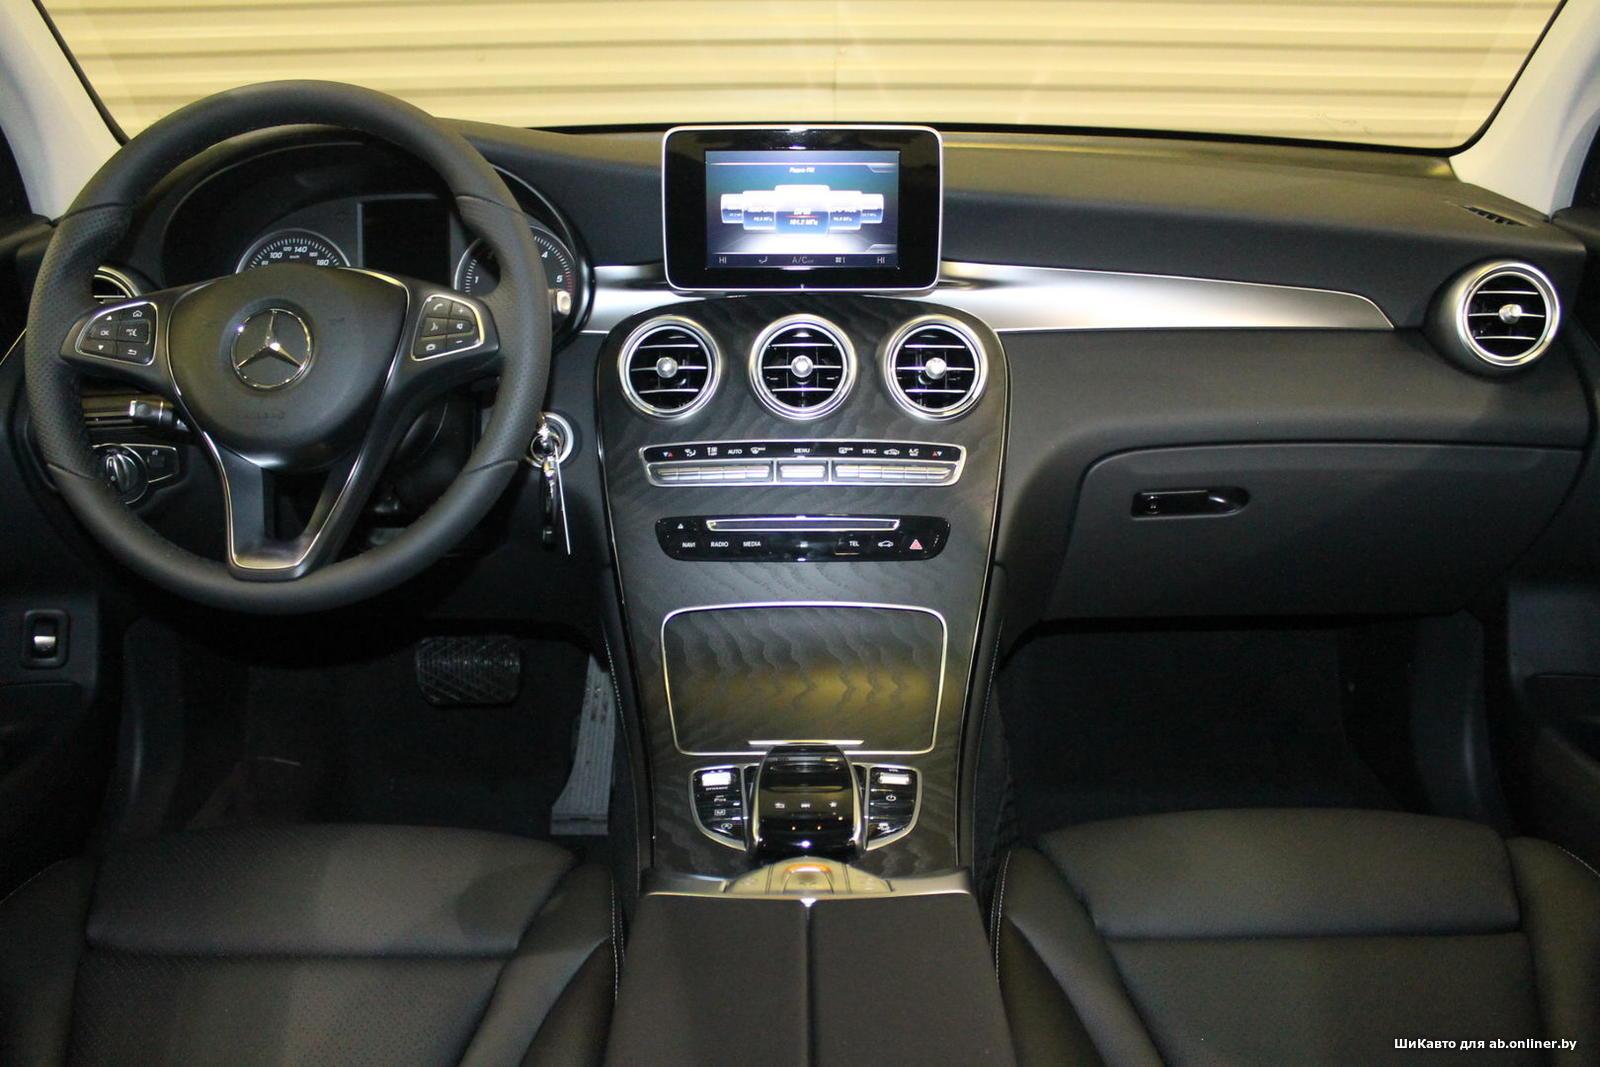 Mercedes GLC250 d 4MATIC Особая сери